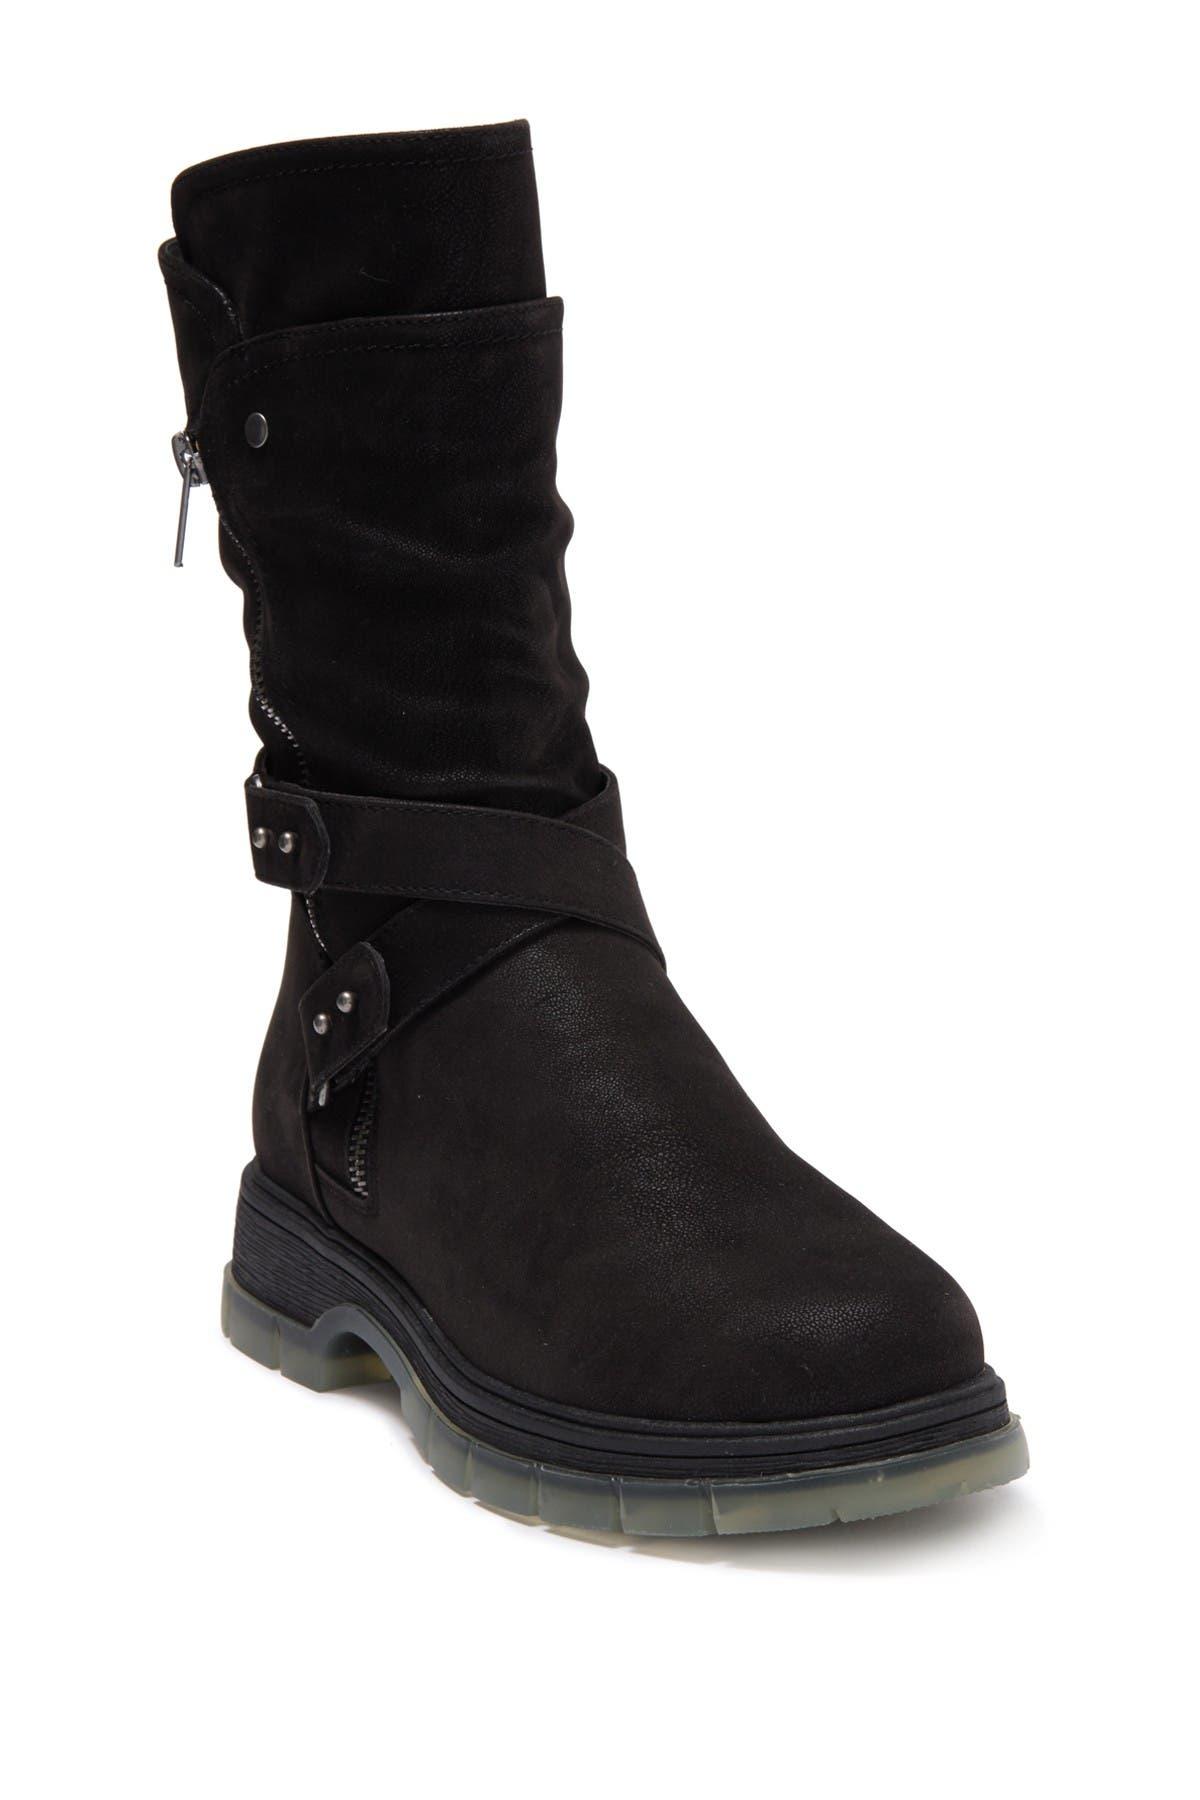 Image of MIA Colt Boot